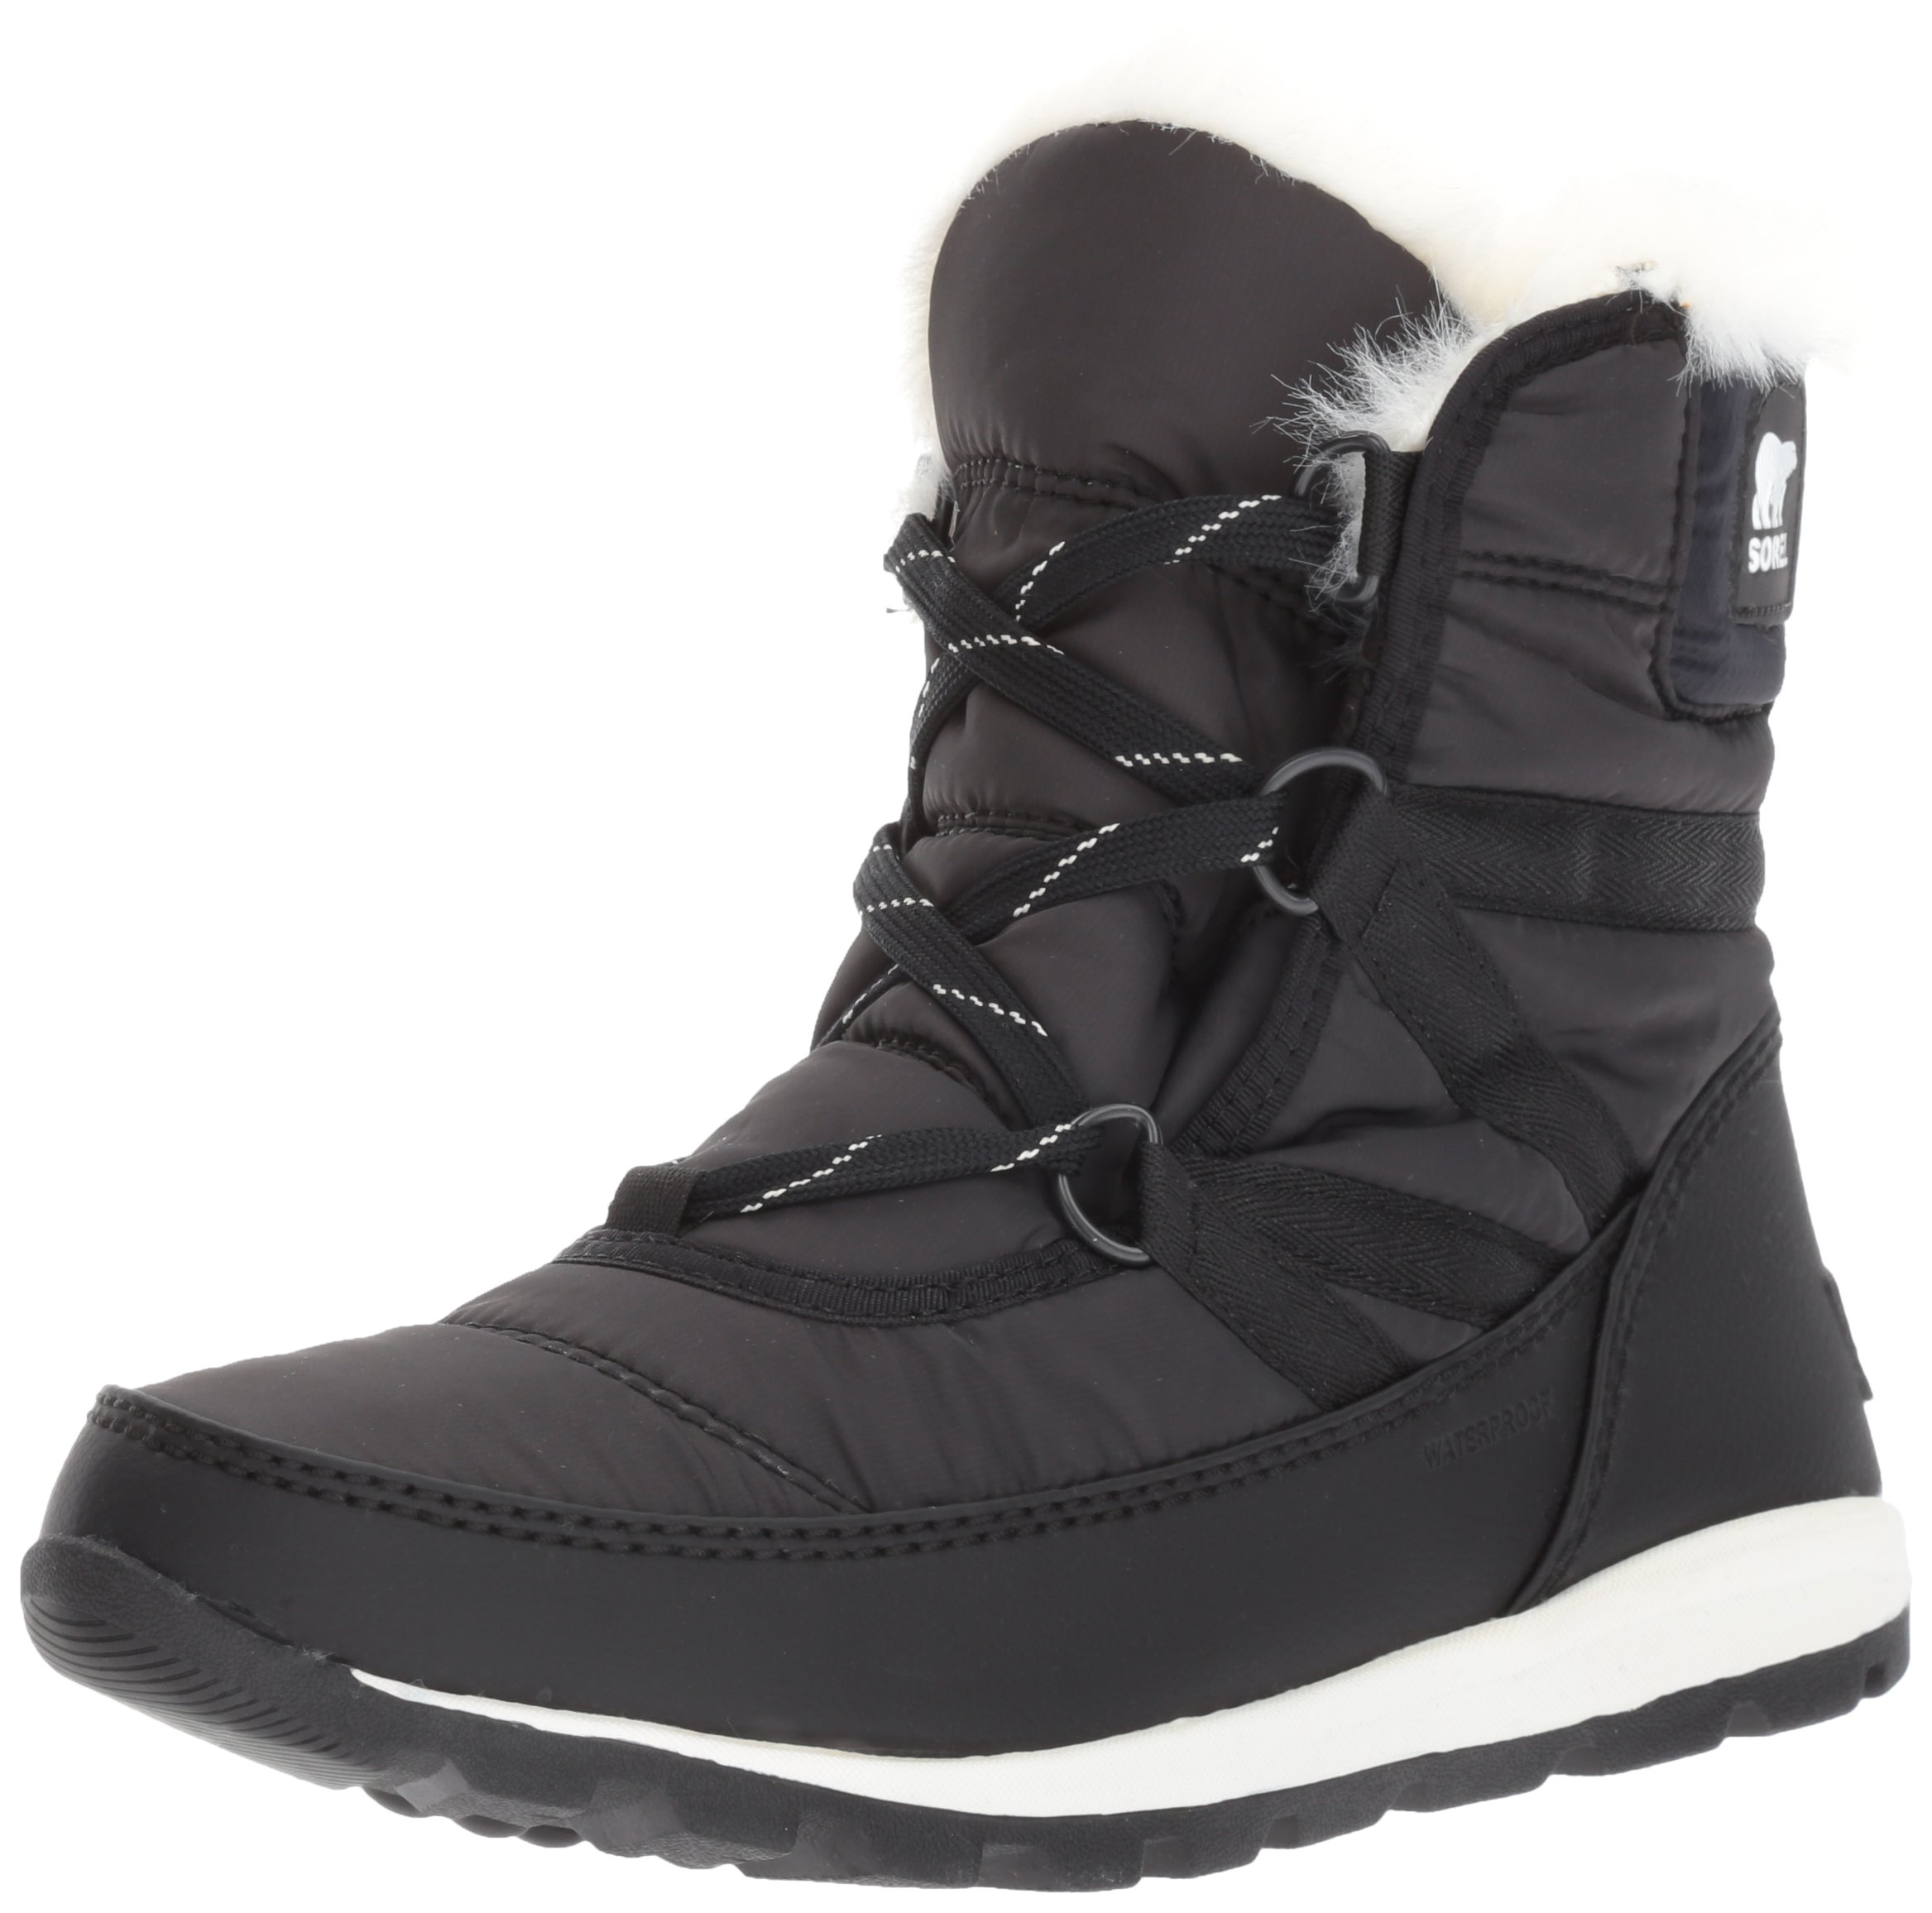 Sorel Women's Whitney Short Lace Snow Boot, Black, Sea Salt, 8 M US